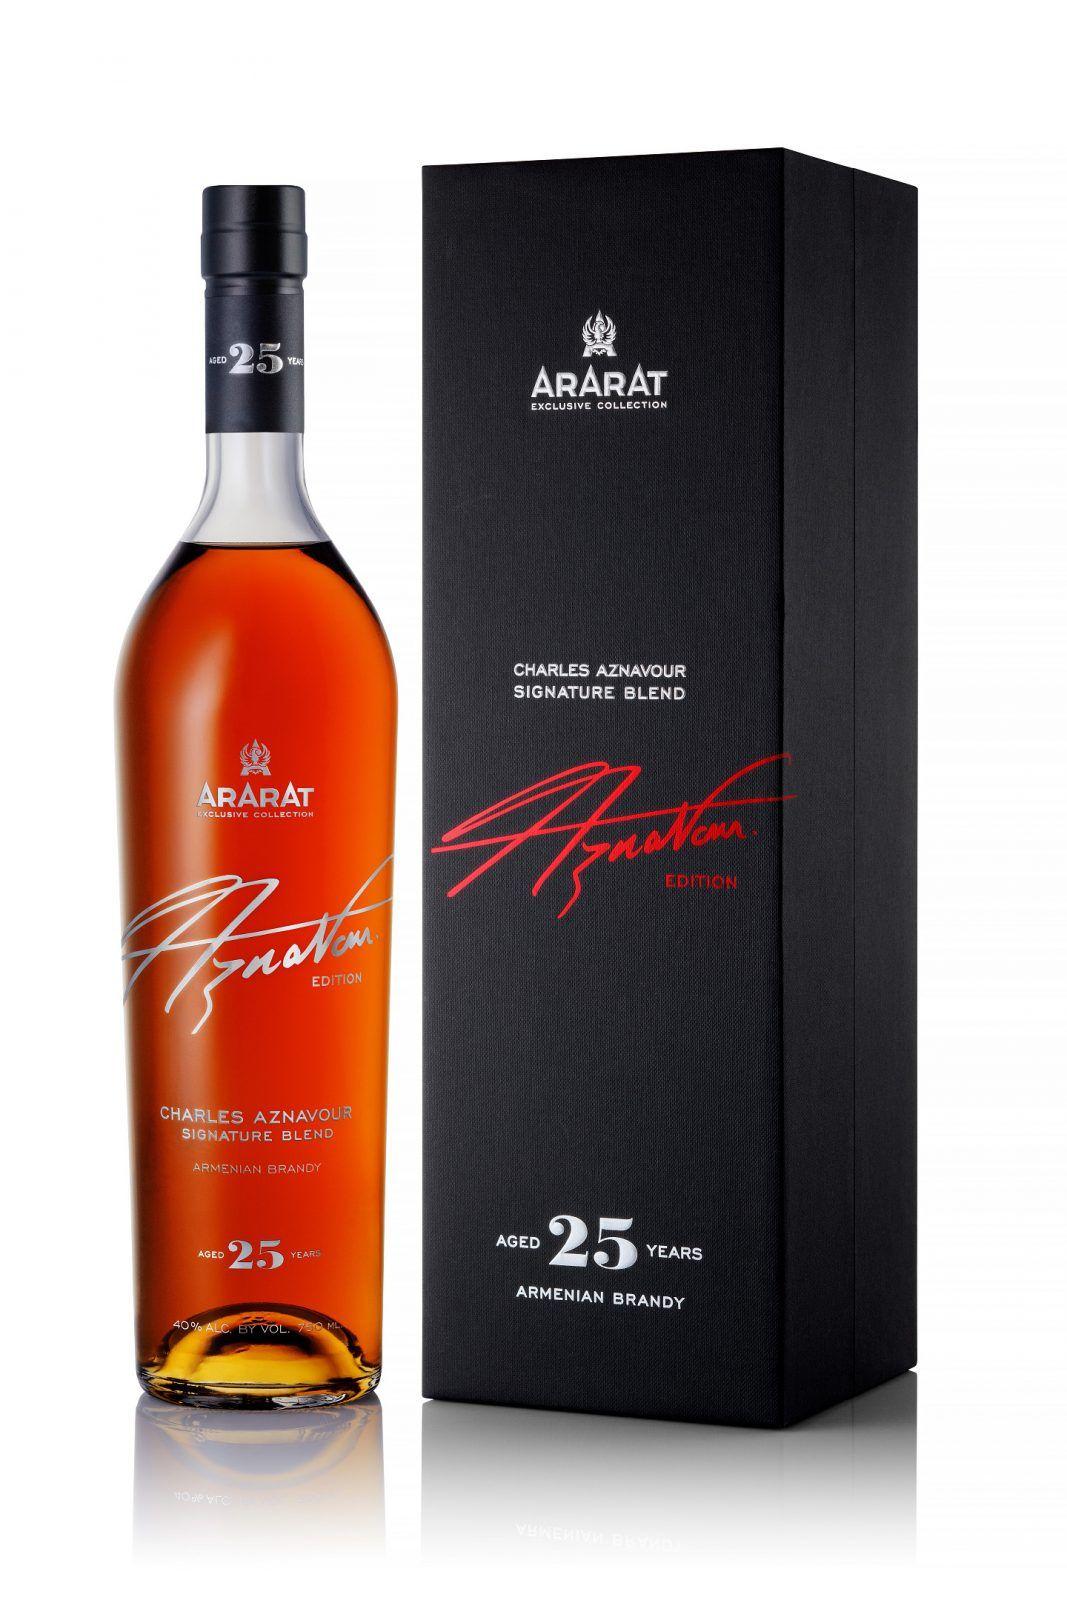 Ararat Charles Aznavour Signature Blend World Brand Design Society Yerevan Brandy Factory Released 2 Whiskey Packaging Packaging Design Armenian Brandy